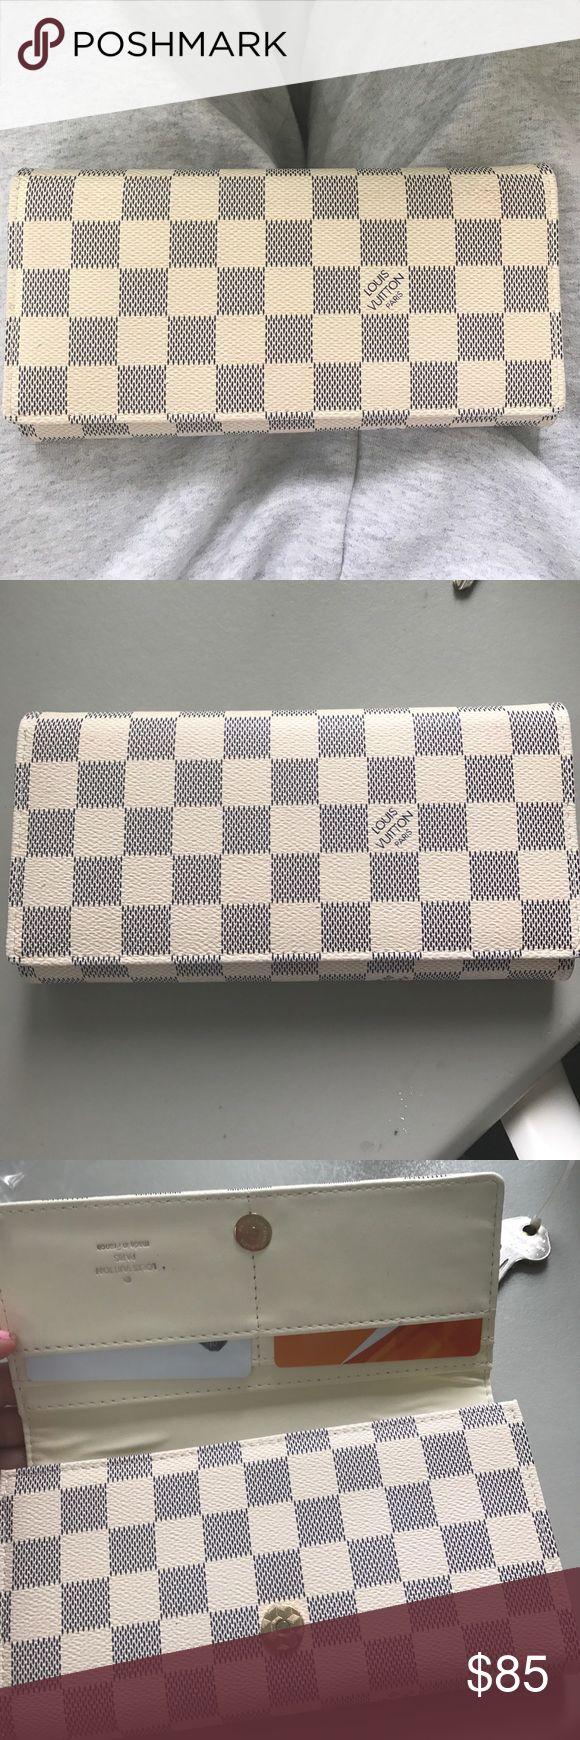 Louis Vuitton wallet Price reflects authenticity Louis Vuitton Bags Wallets